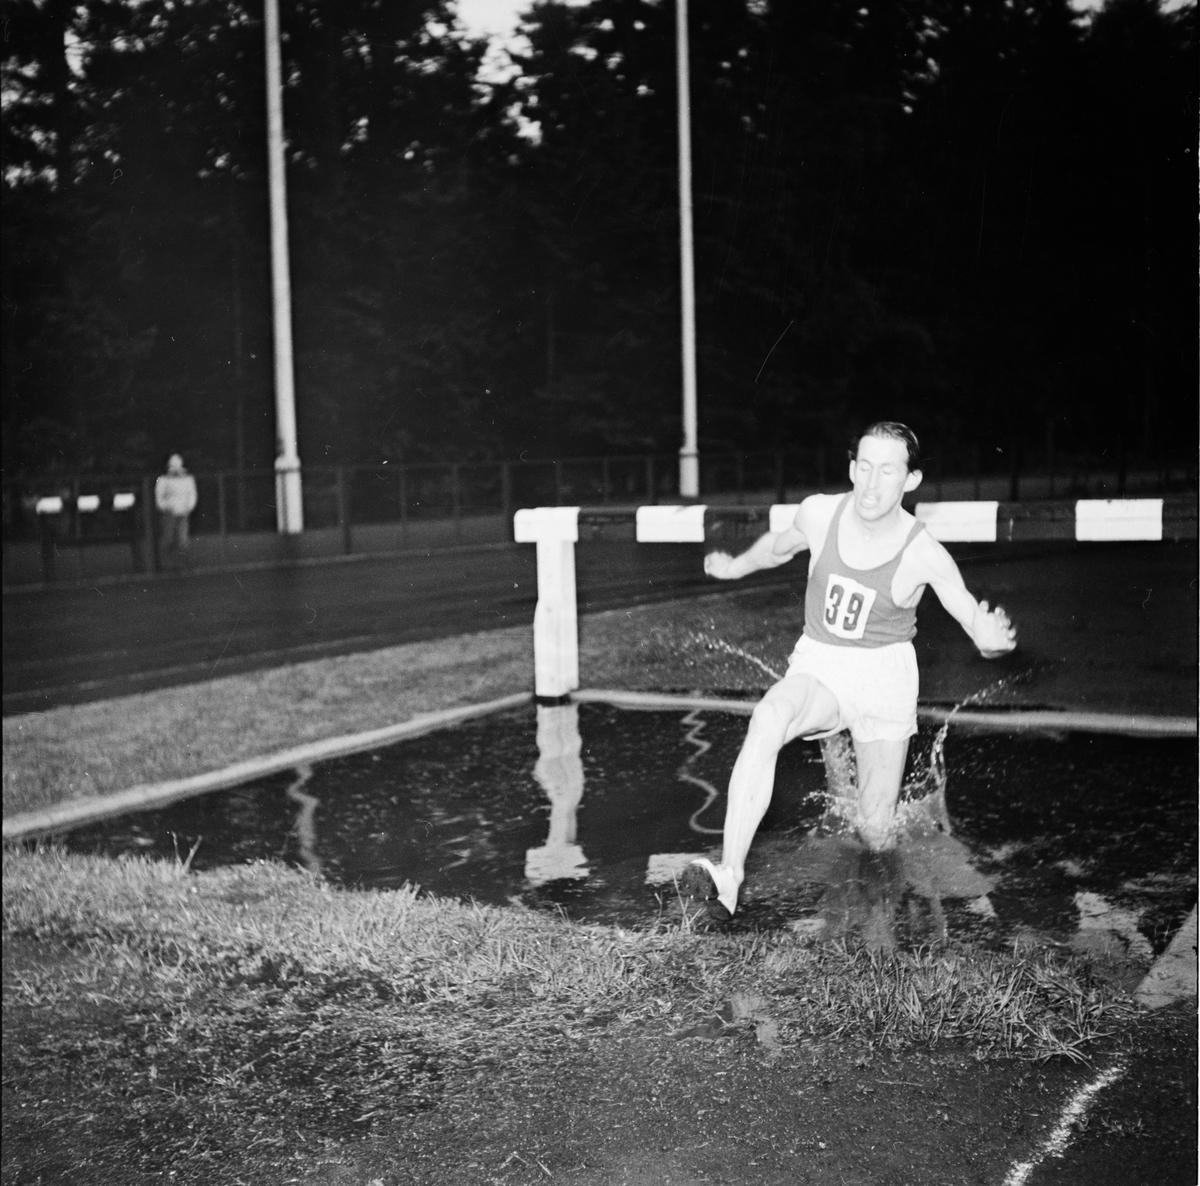 Friidrott, distriktsmästerskap, Studenternas Idrottsplats, Uppsala, 1952